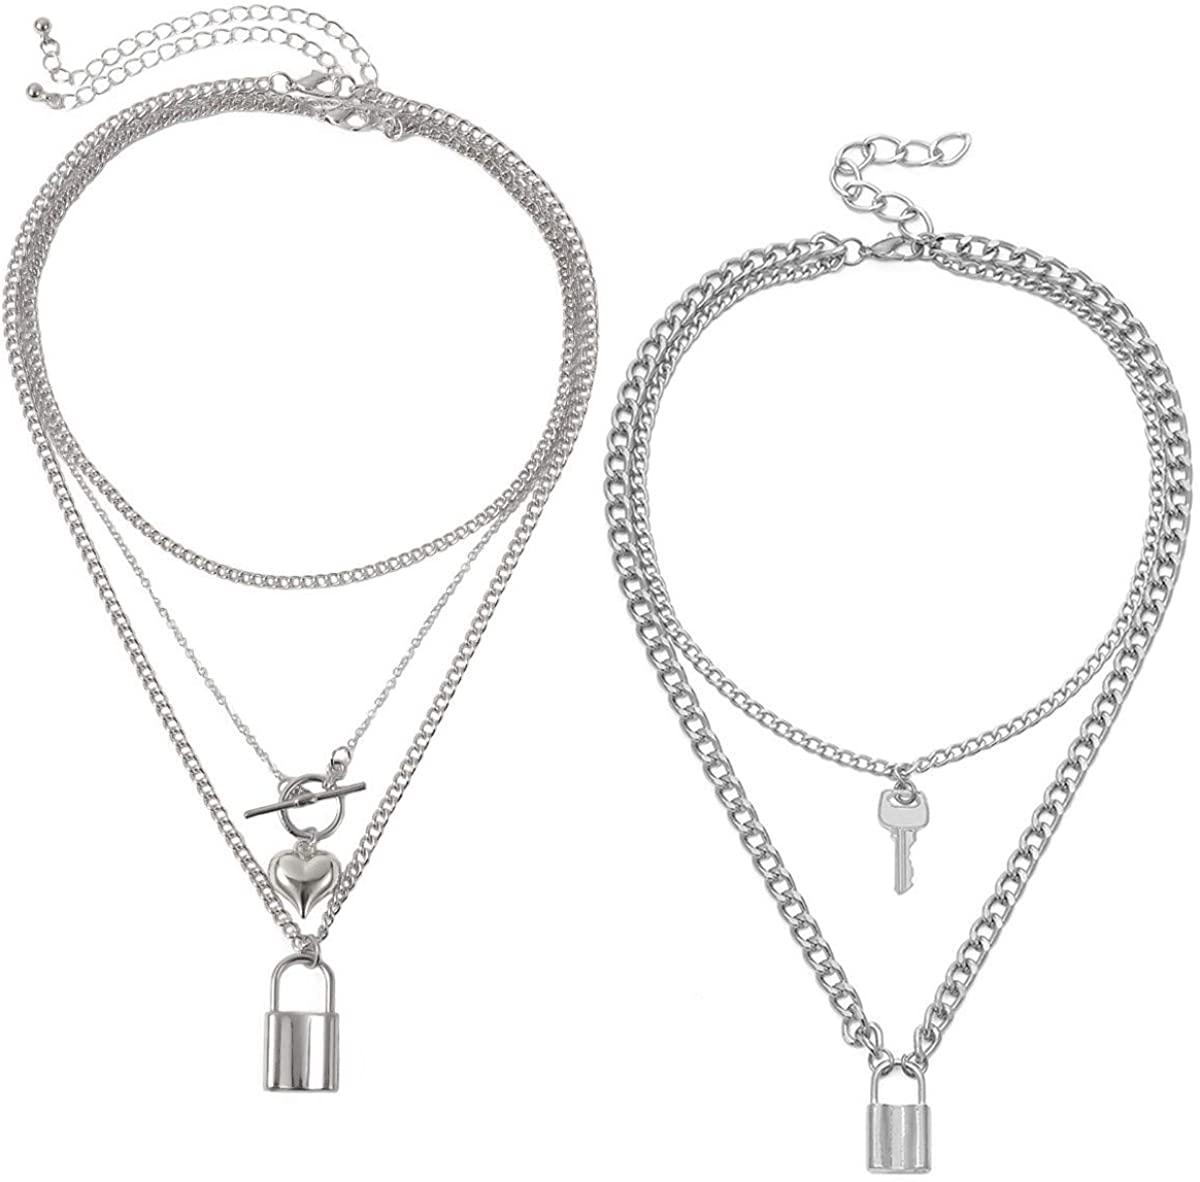 Nanafast 2 PCS Layered Lock Necklace Set Adjustable Padlock Chain Choker Necklace Punk Heart Lock Pendant Necklace for Women Men Teen Girls Personalized Lock Gifts